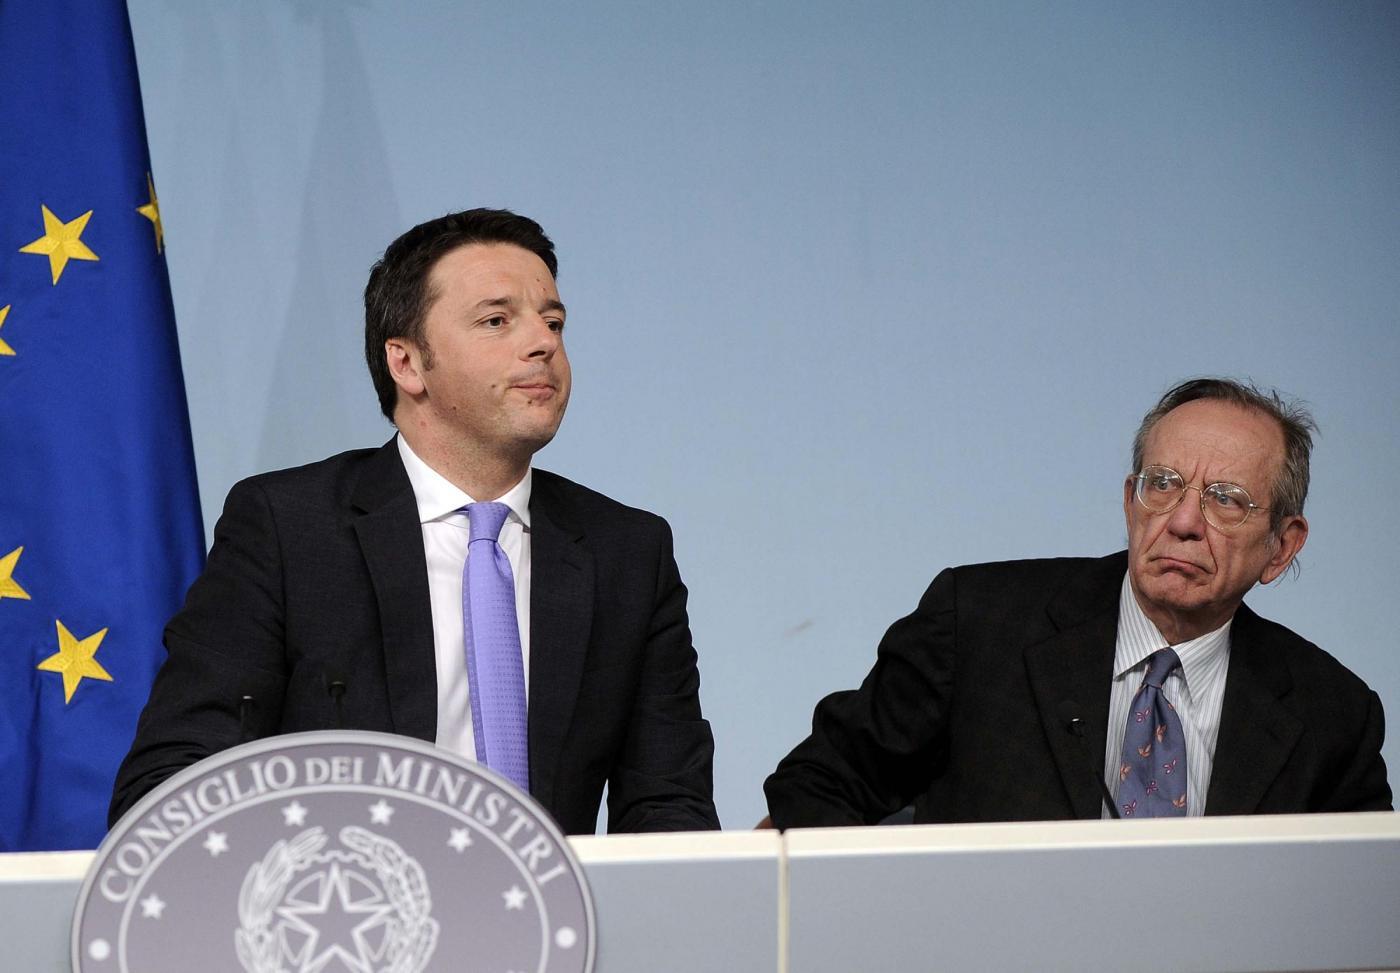 Briciole di Pil per Renzi: assist Istat al referendum